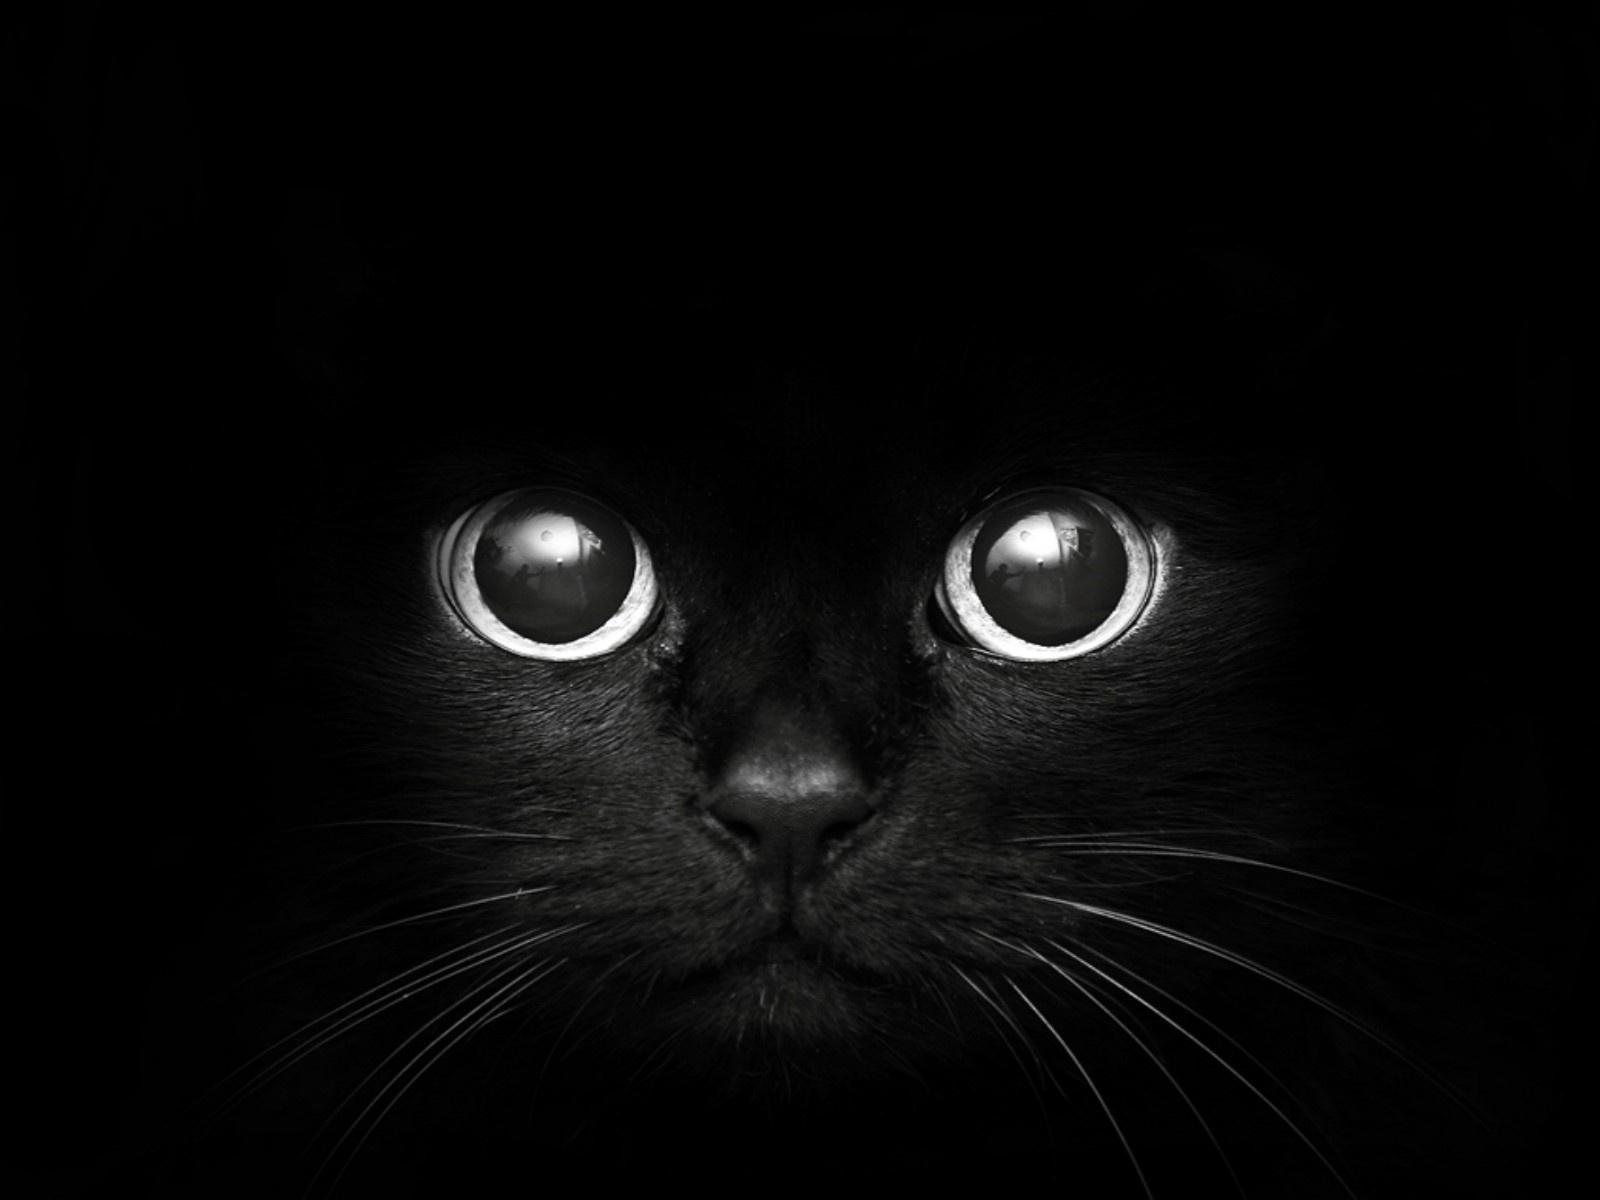 Free Download Black Eyes Wallpaper Beautiful Black Eyes Wallpapers Black Cat Eyes 1600x1200 For Your Desktop Mobile Tablet Explore 48 Black Cat Wallpaper Drawings Cats Wallpaper Cat Wallpaper 1920x1080